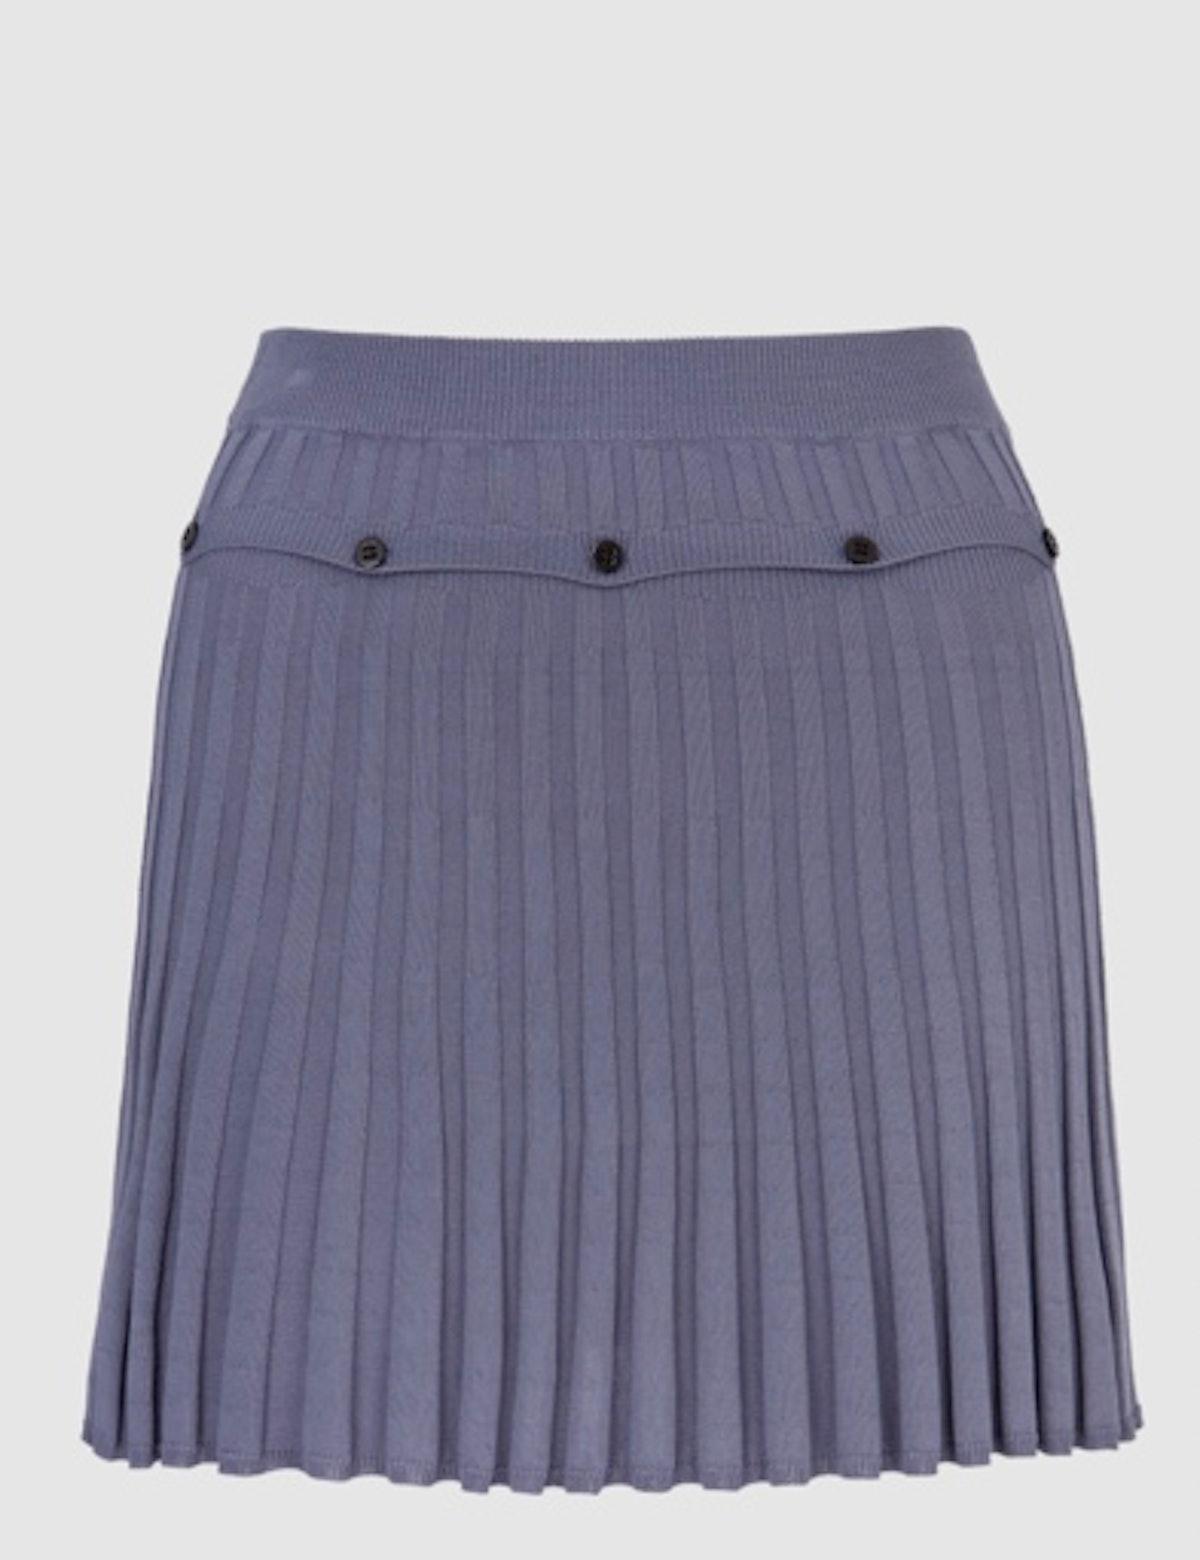 Onyx Pleated Knit Mini Skirt